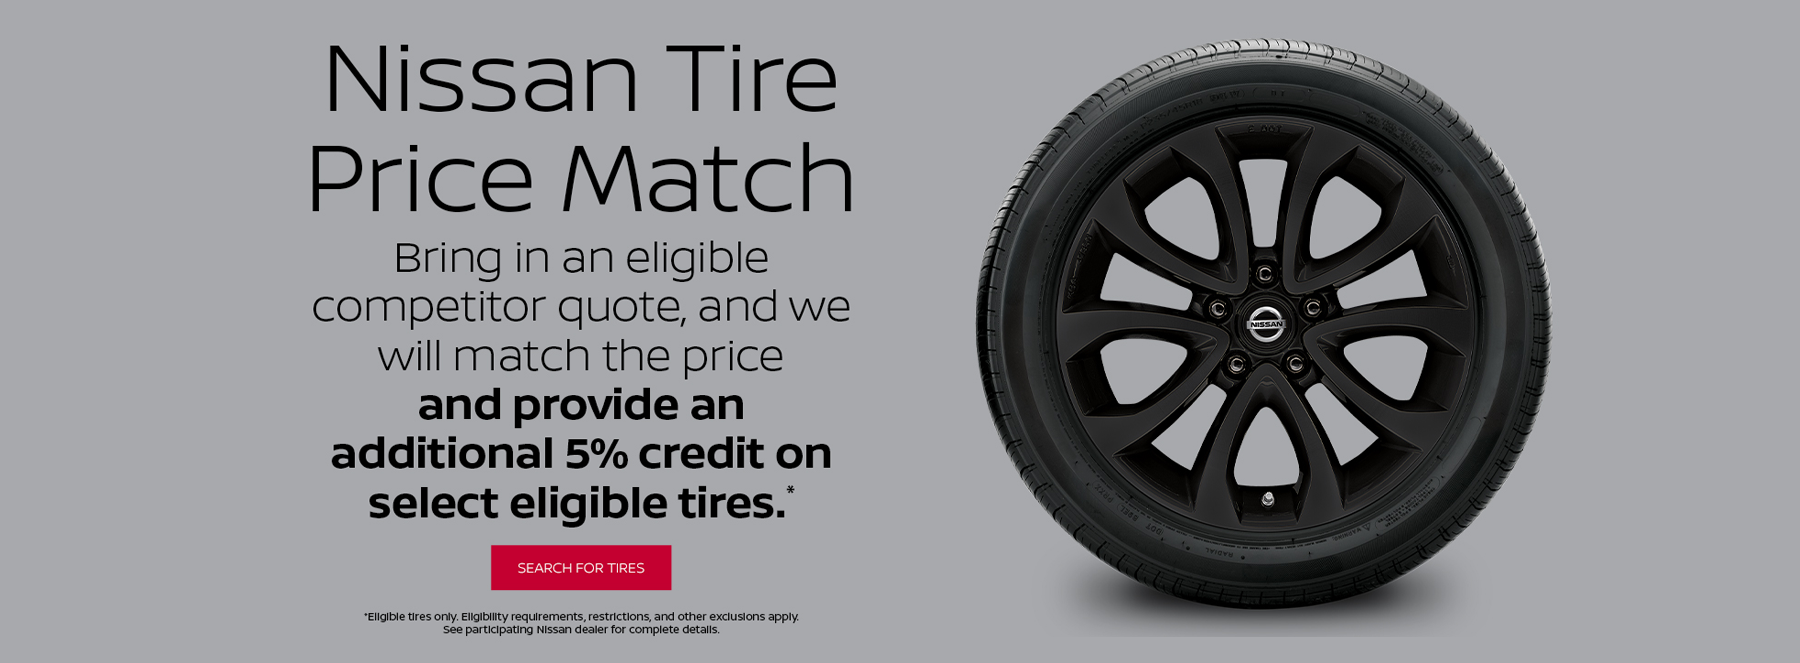 tire_match (1)